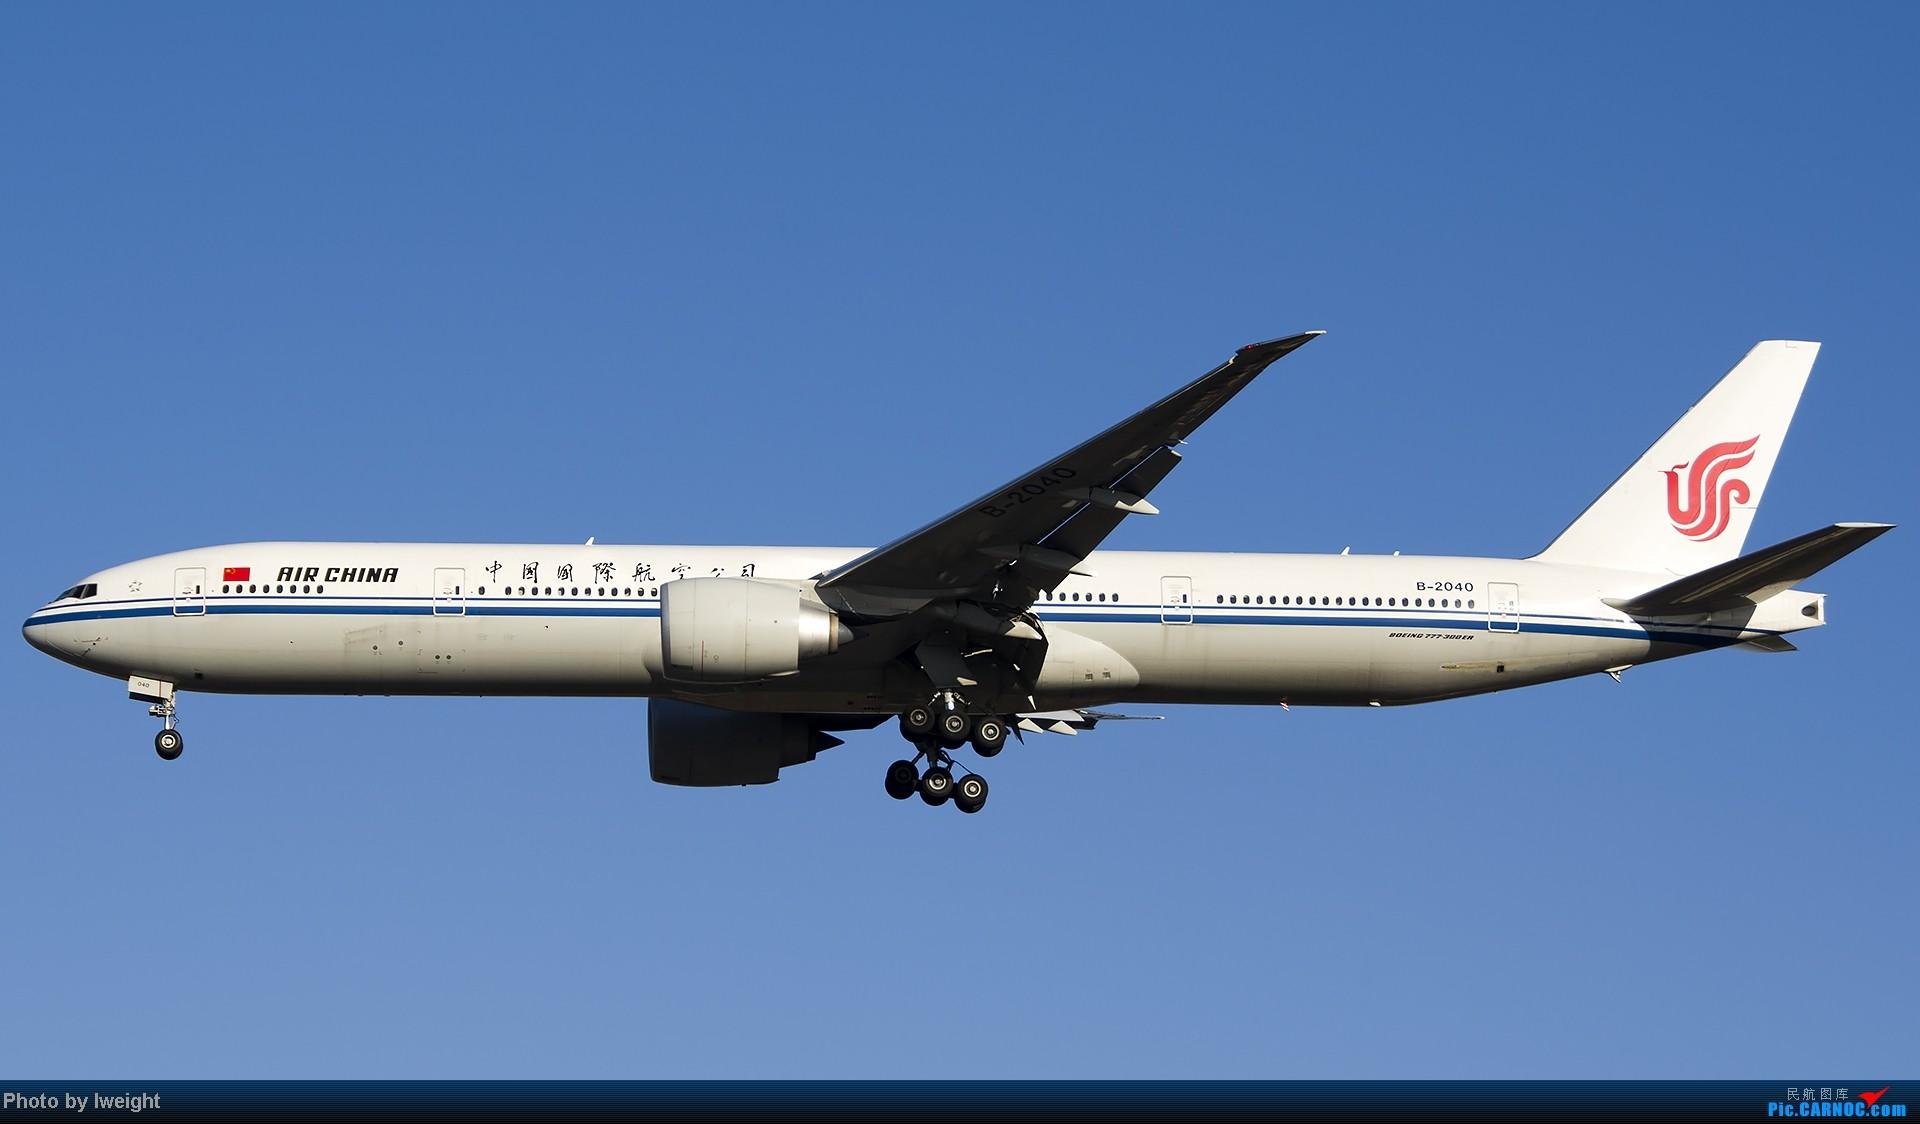 Re:[原创]抓住APEC蓝的尾巴,再拍上一组 BOEING 777-300ER B-2040 中国北京首都机场